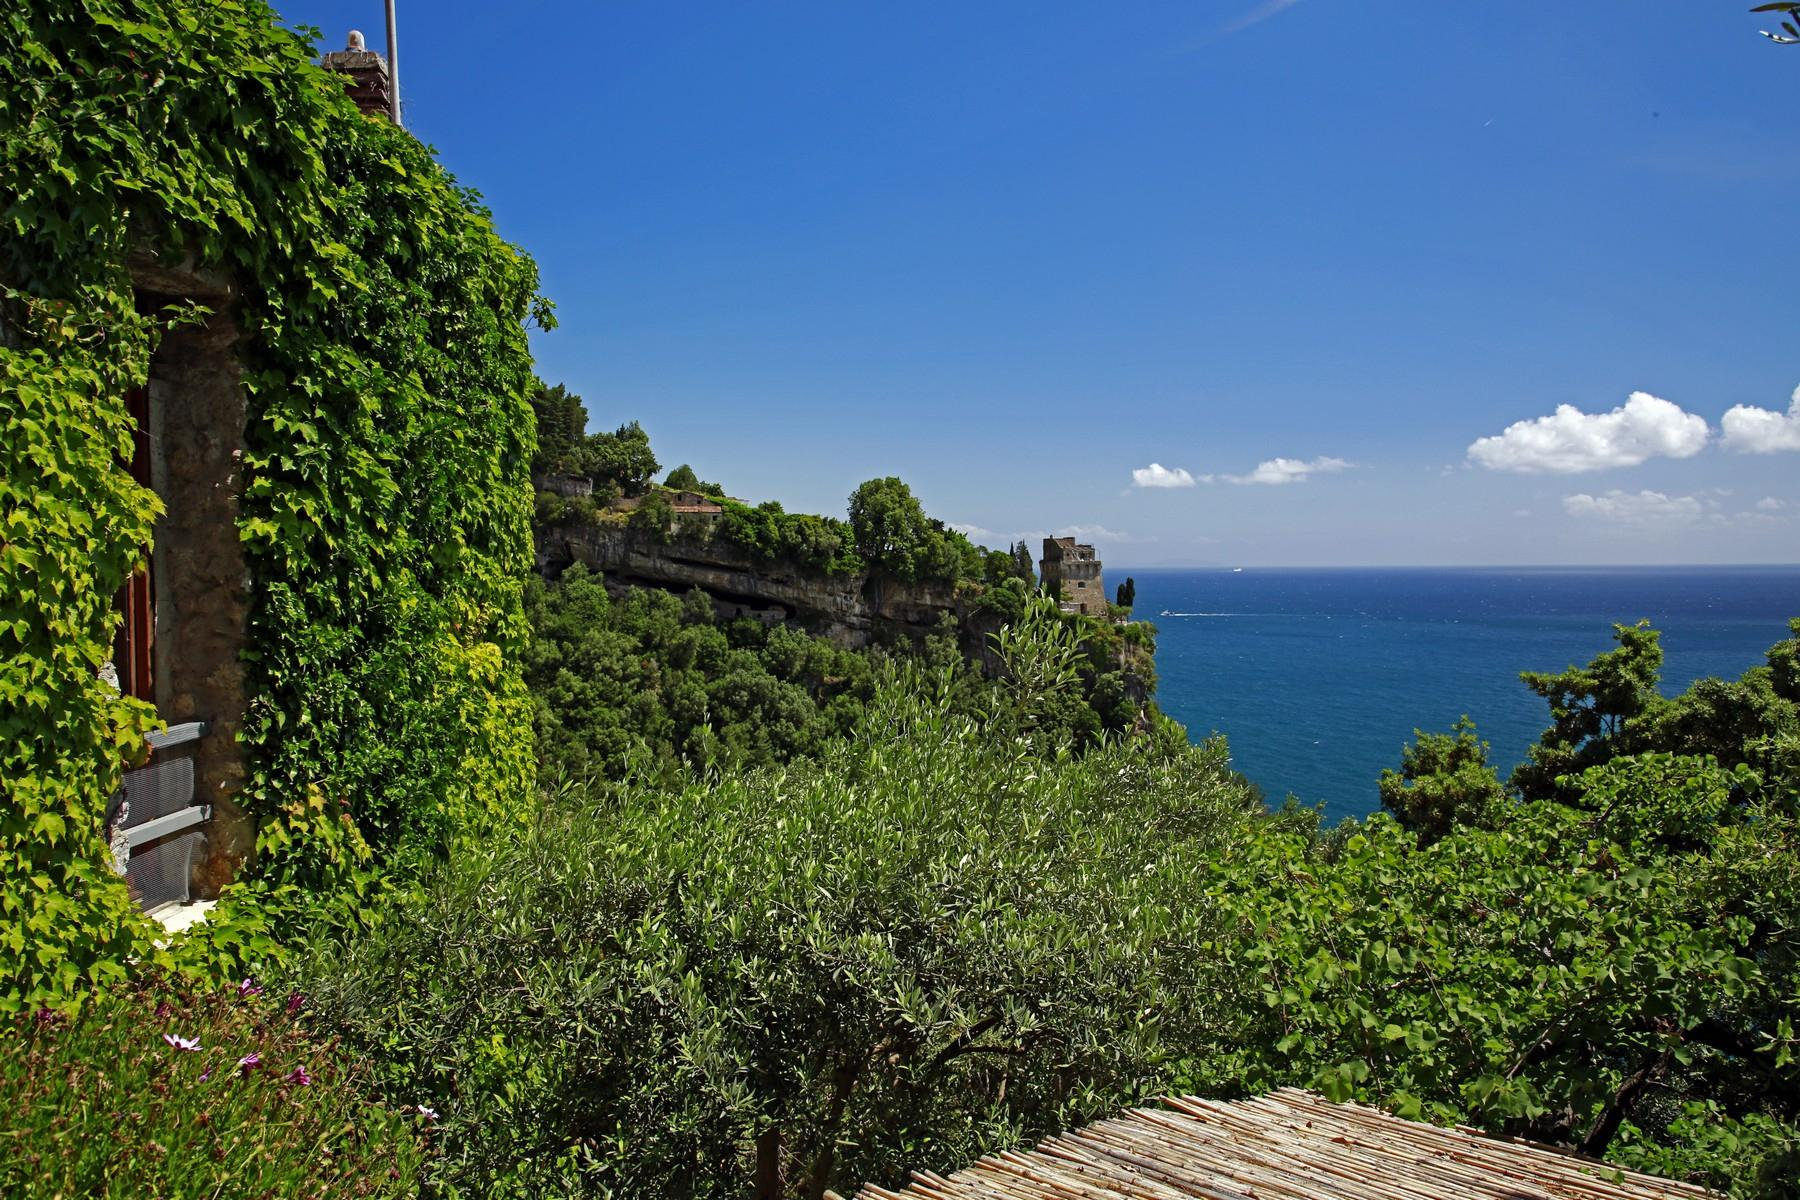 Villa pied dans l'eau in Costiera Amalfitana - 10